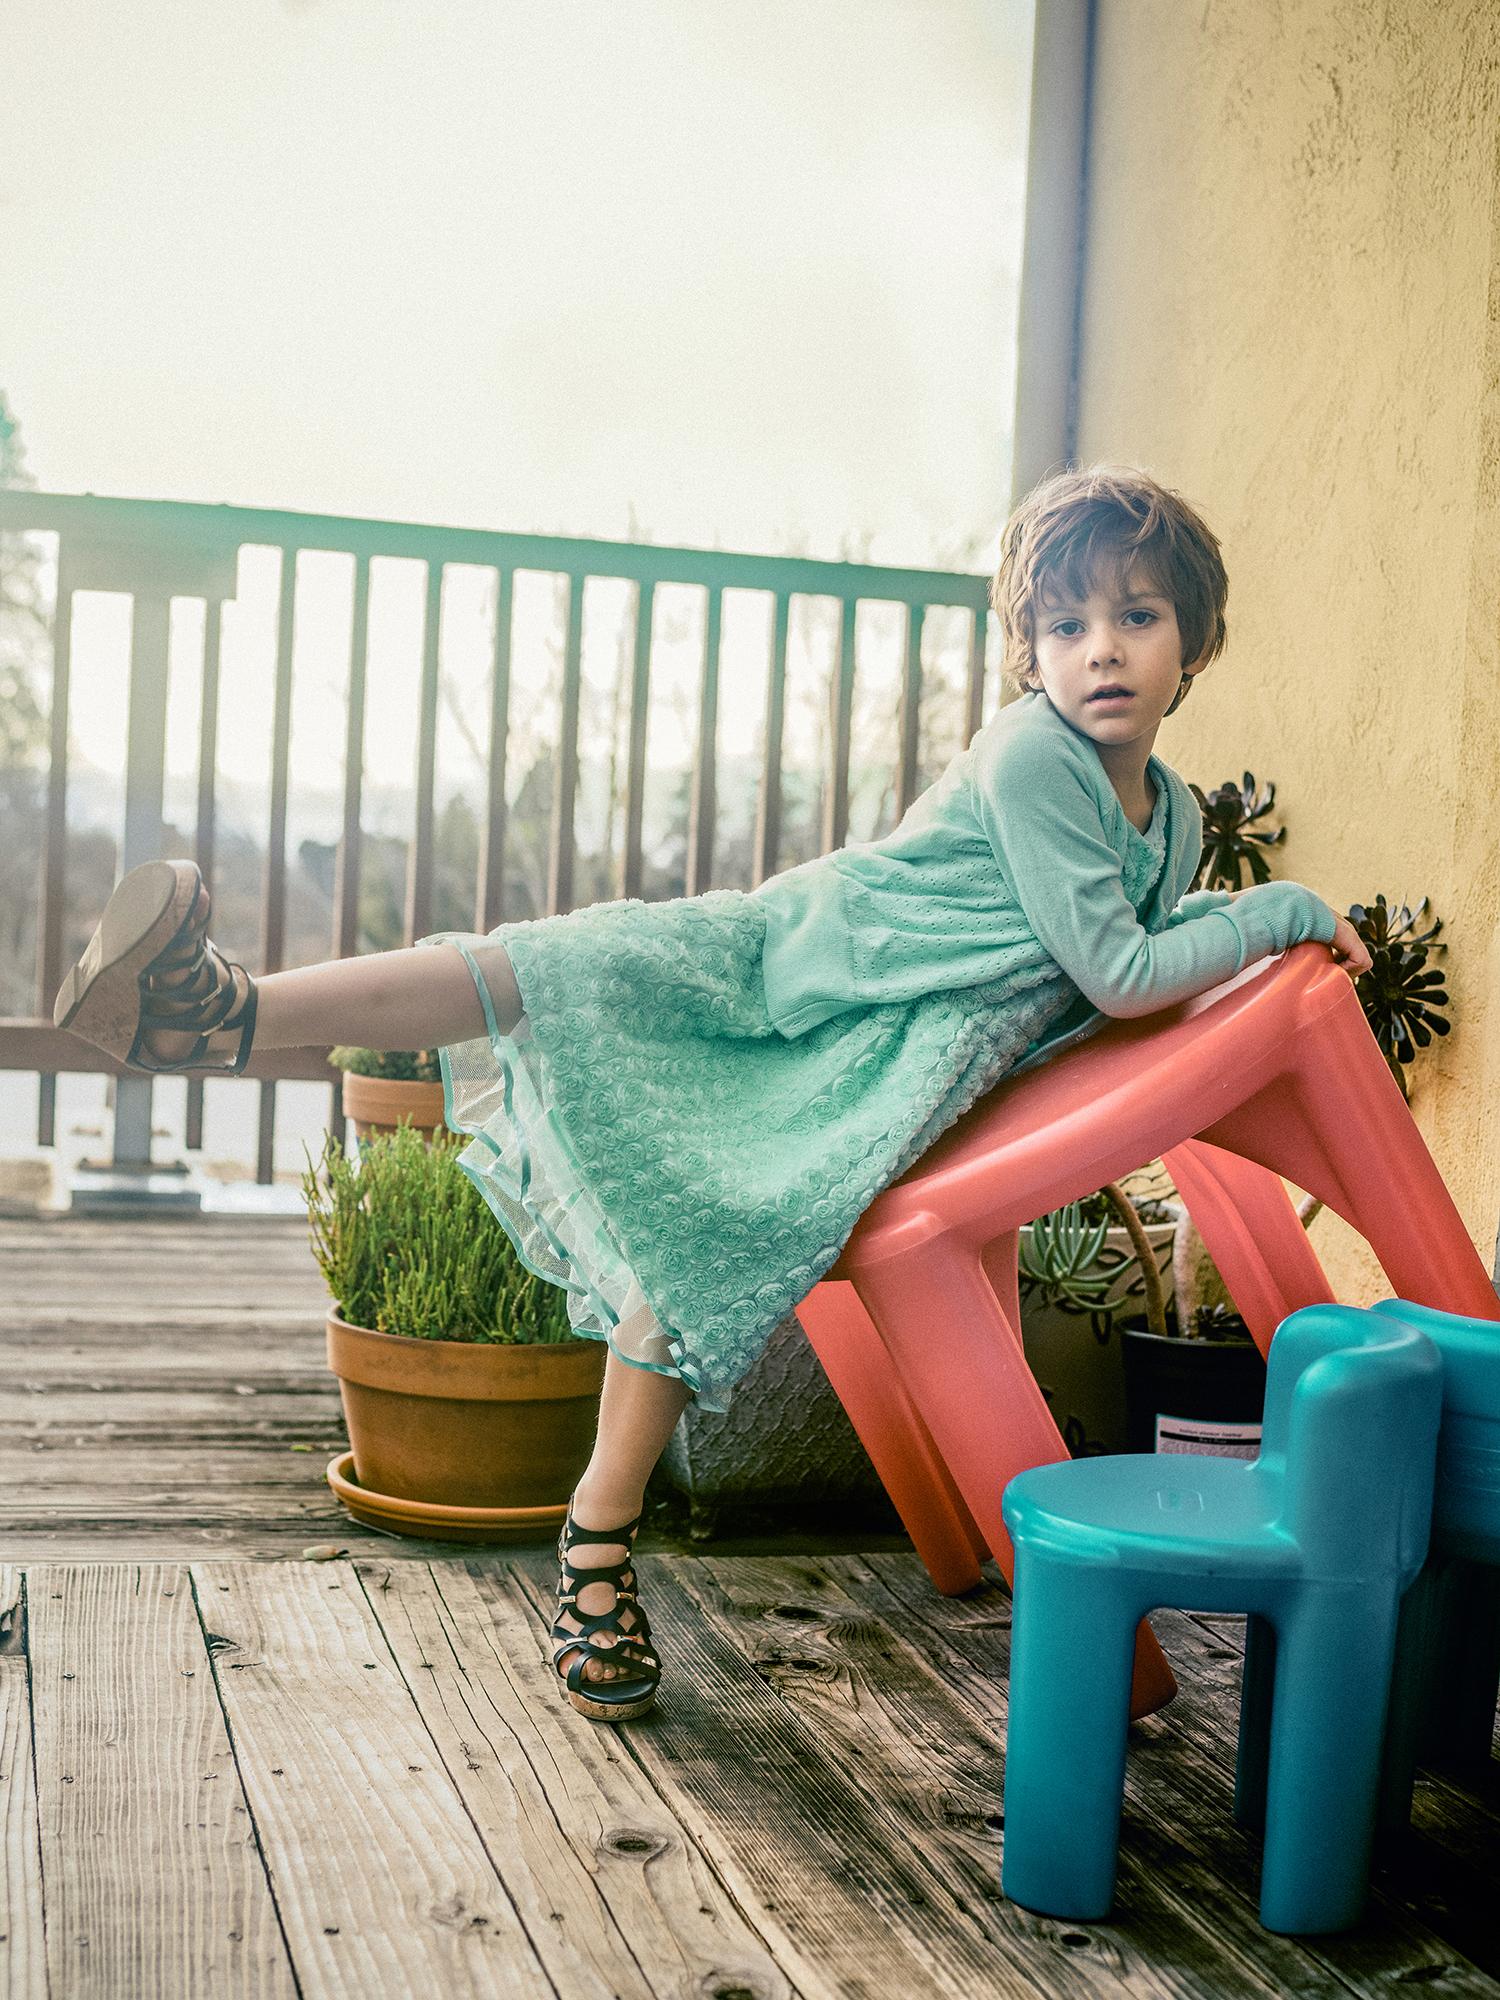 Charlie*, 4, Bay Area, California, transgender girl.